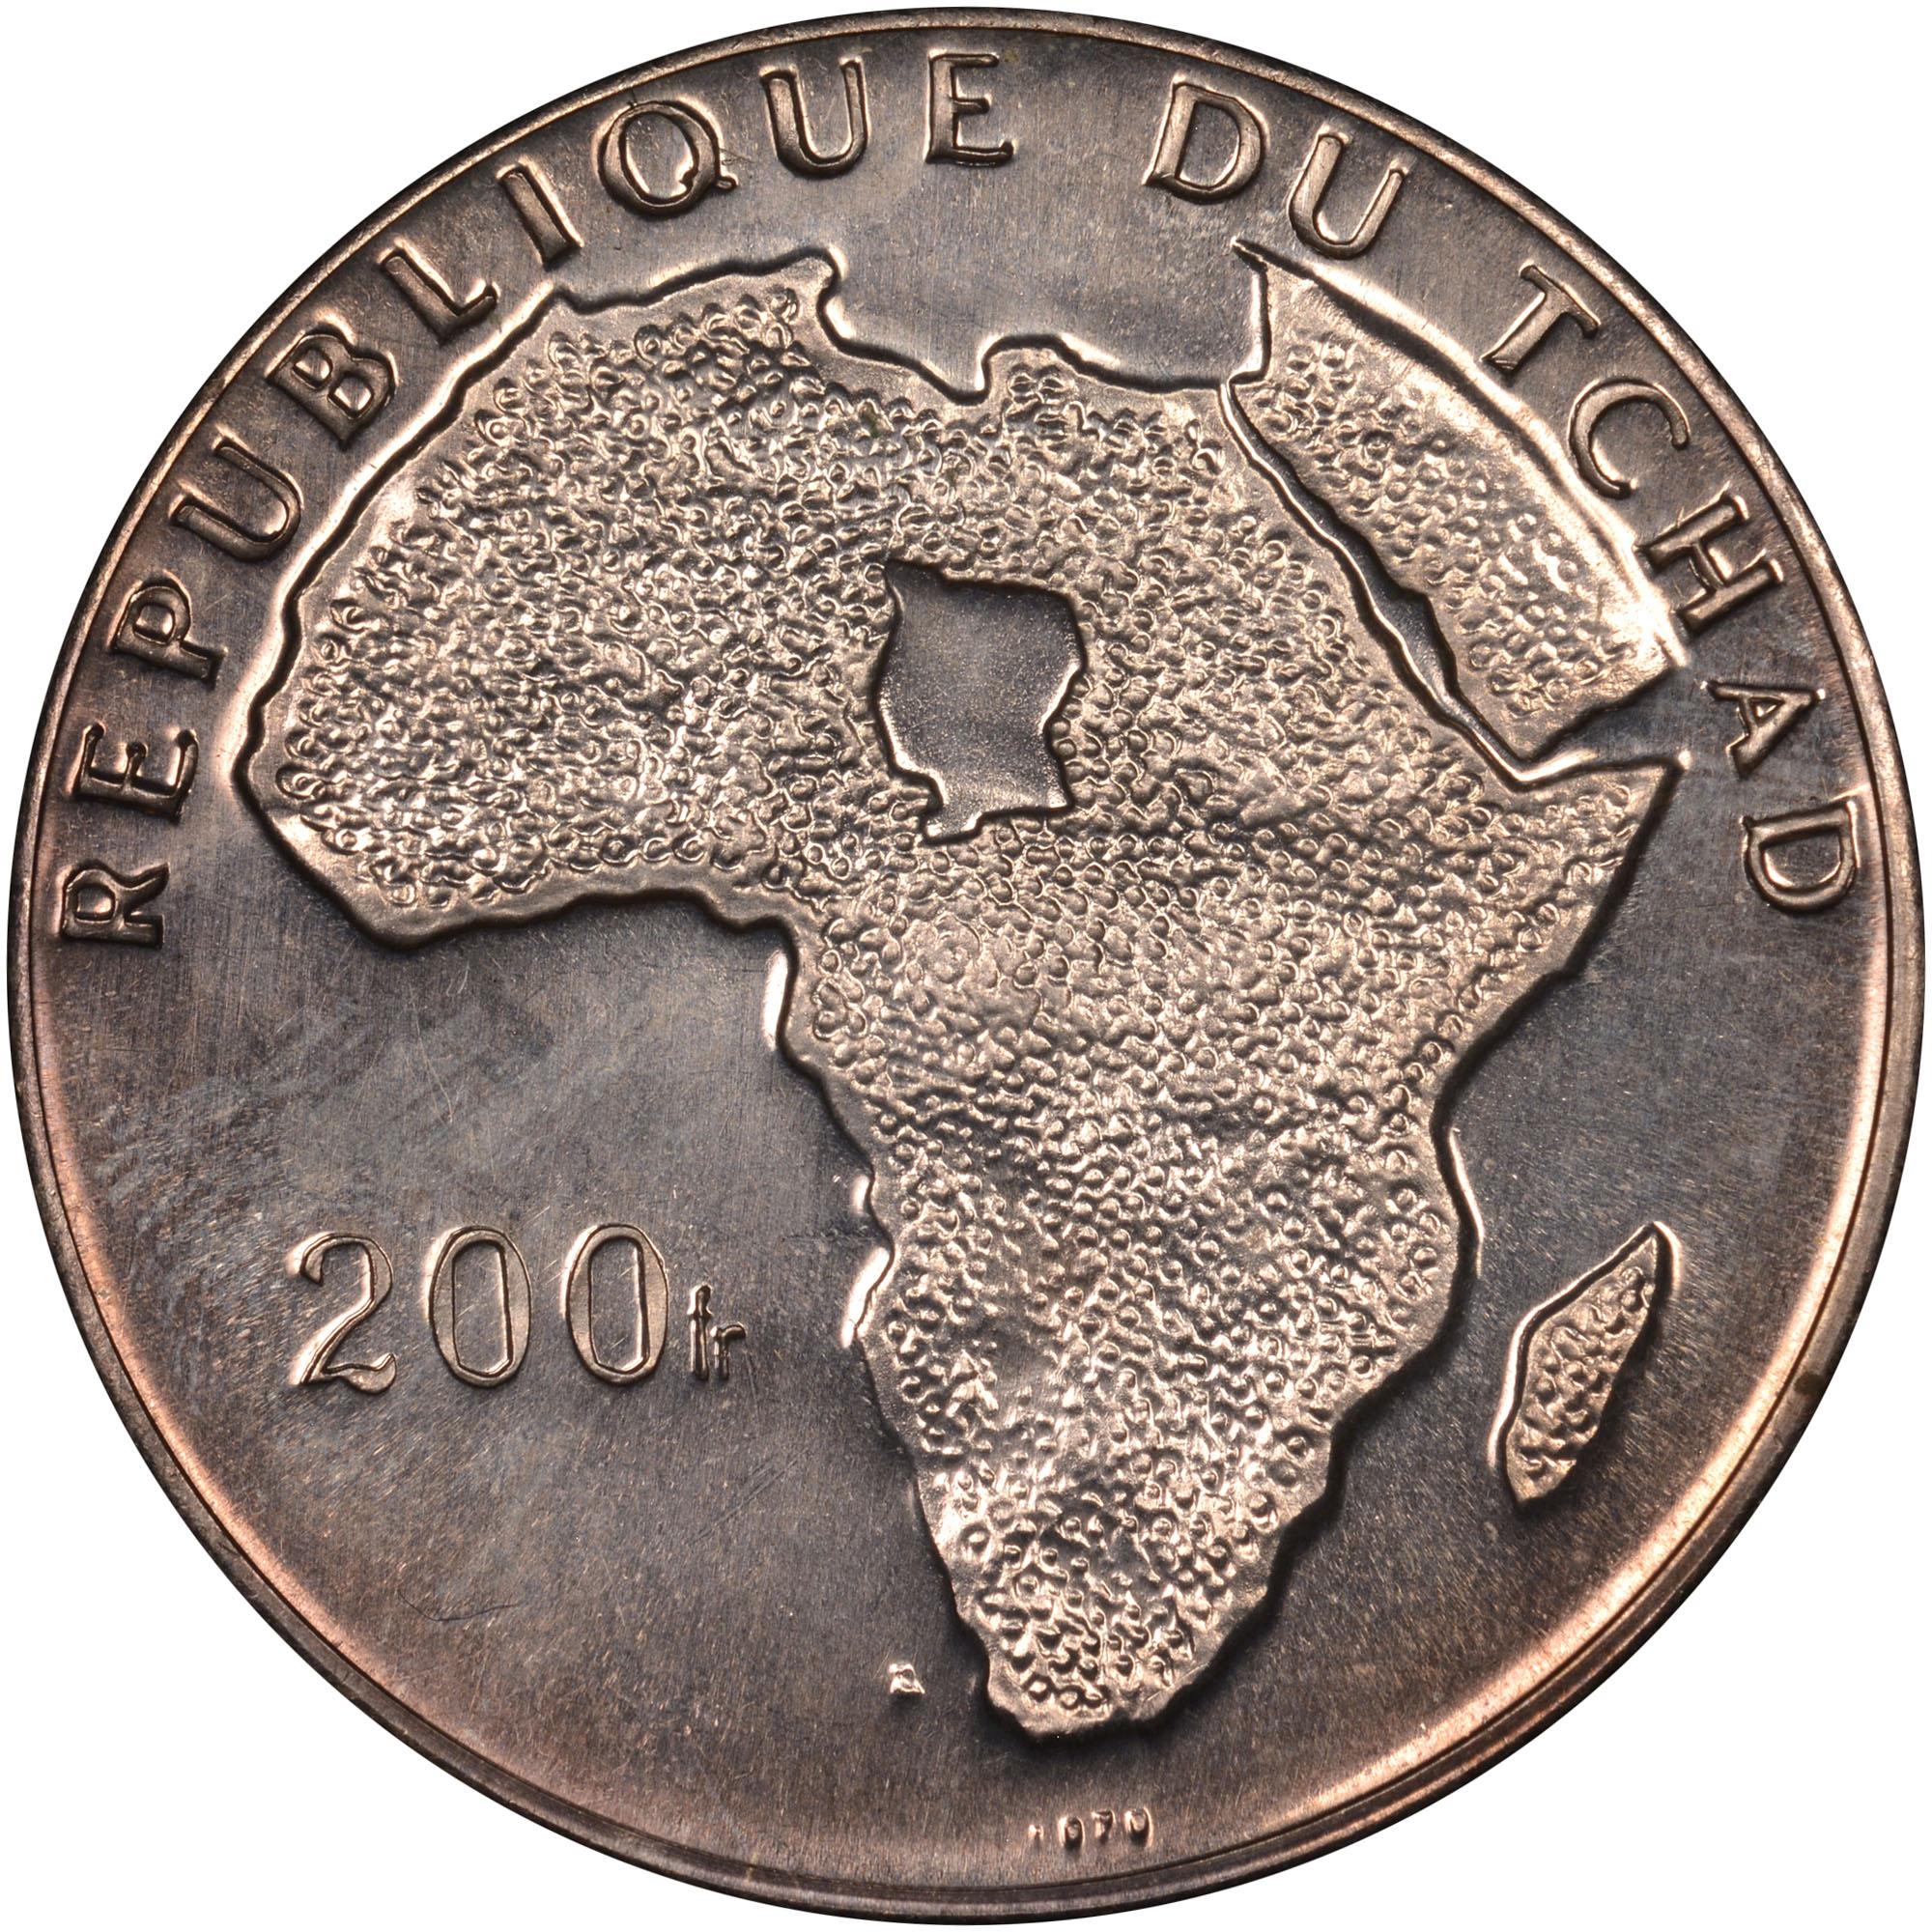 1970 Chad 200 Francs obverse